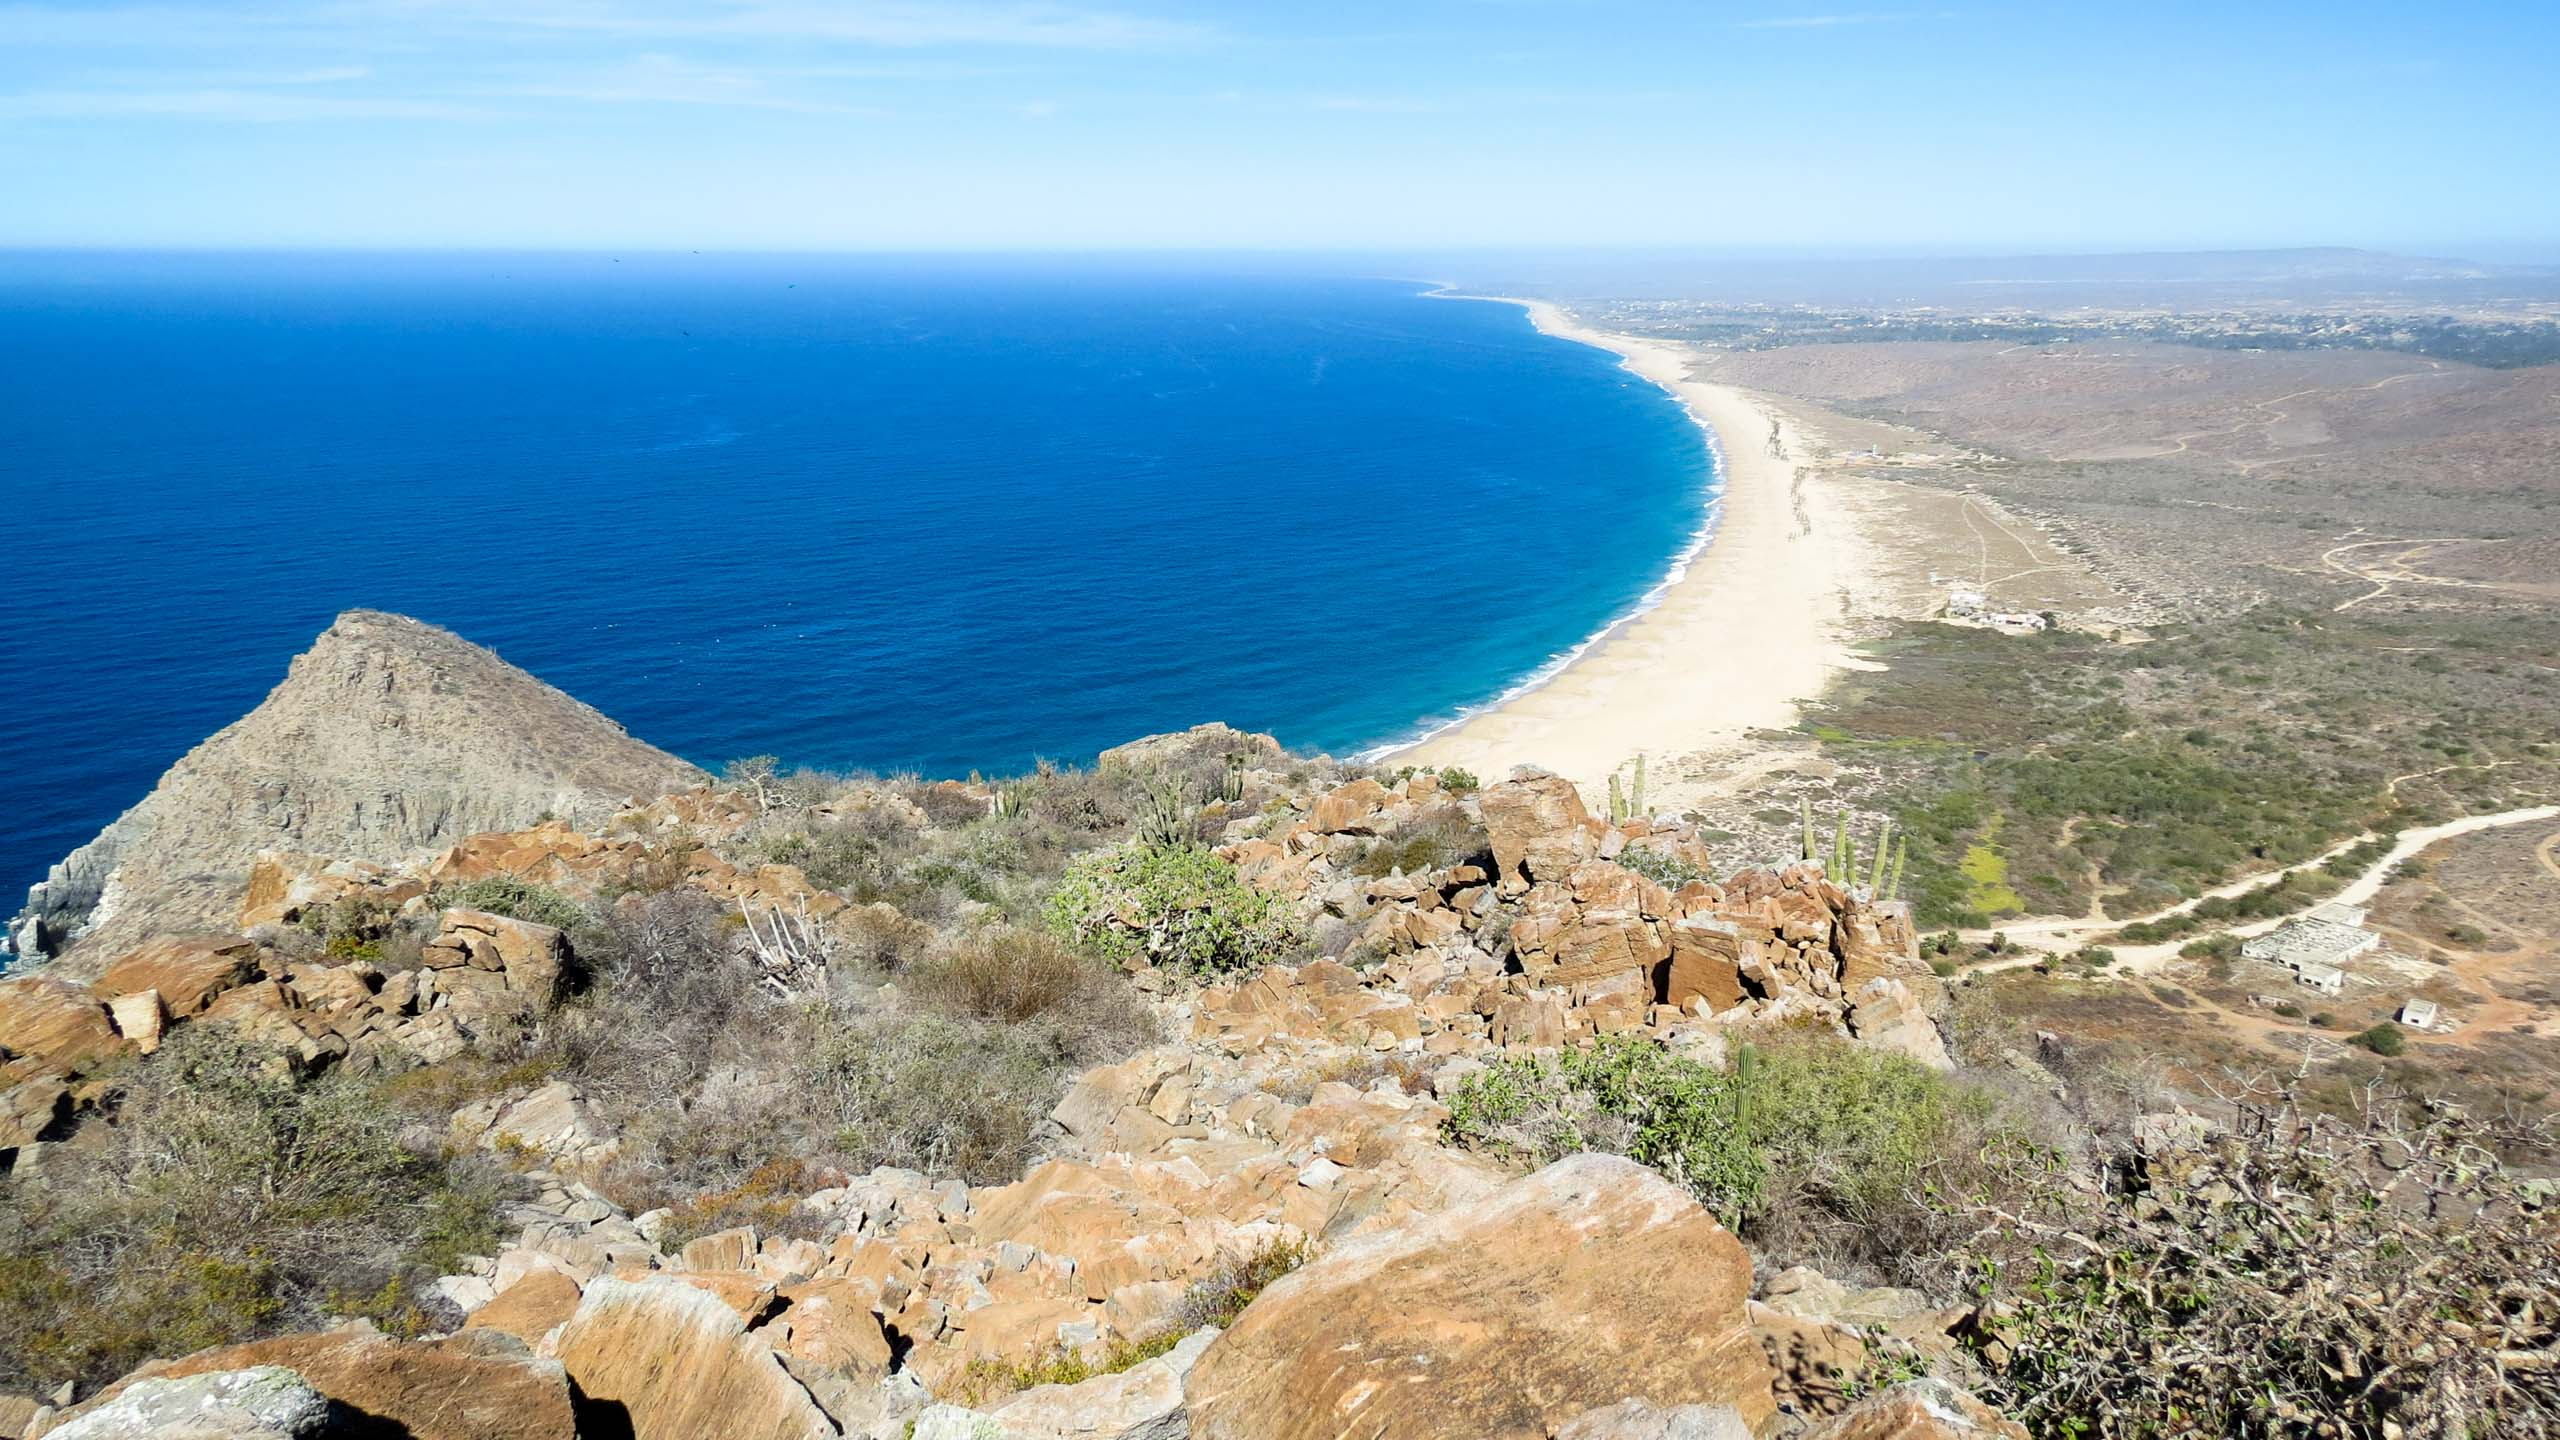 View of beach along Mexico coast